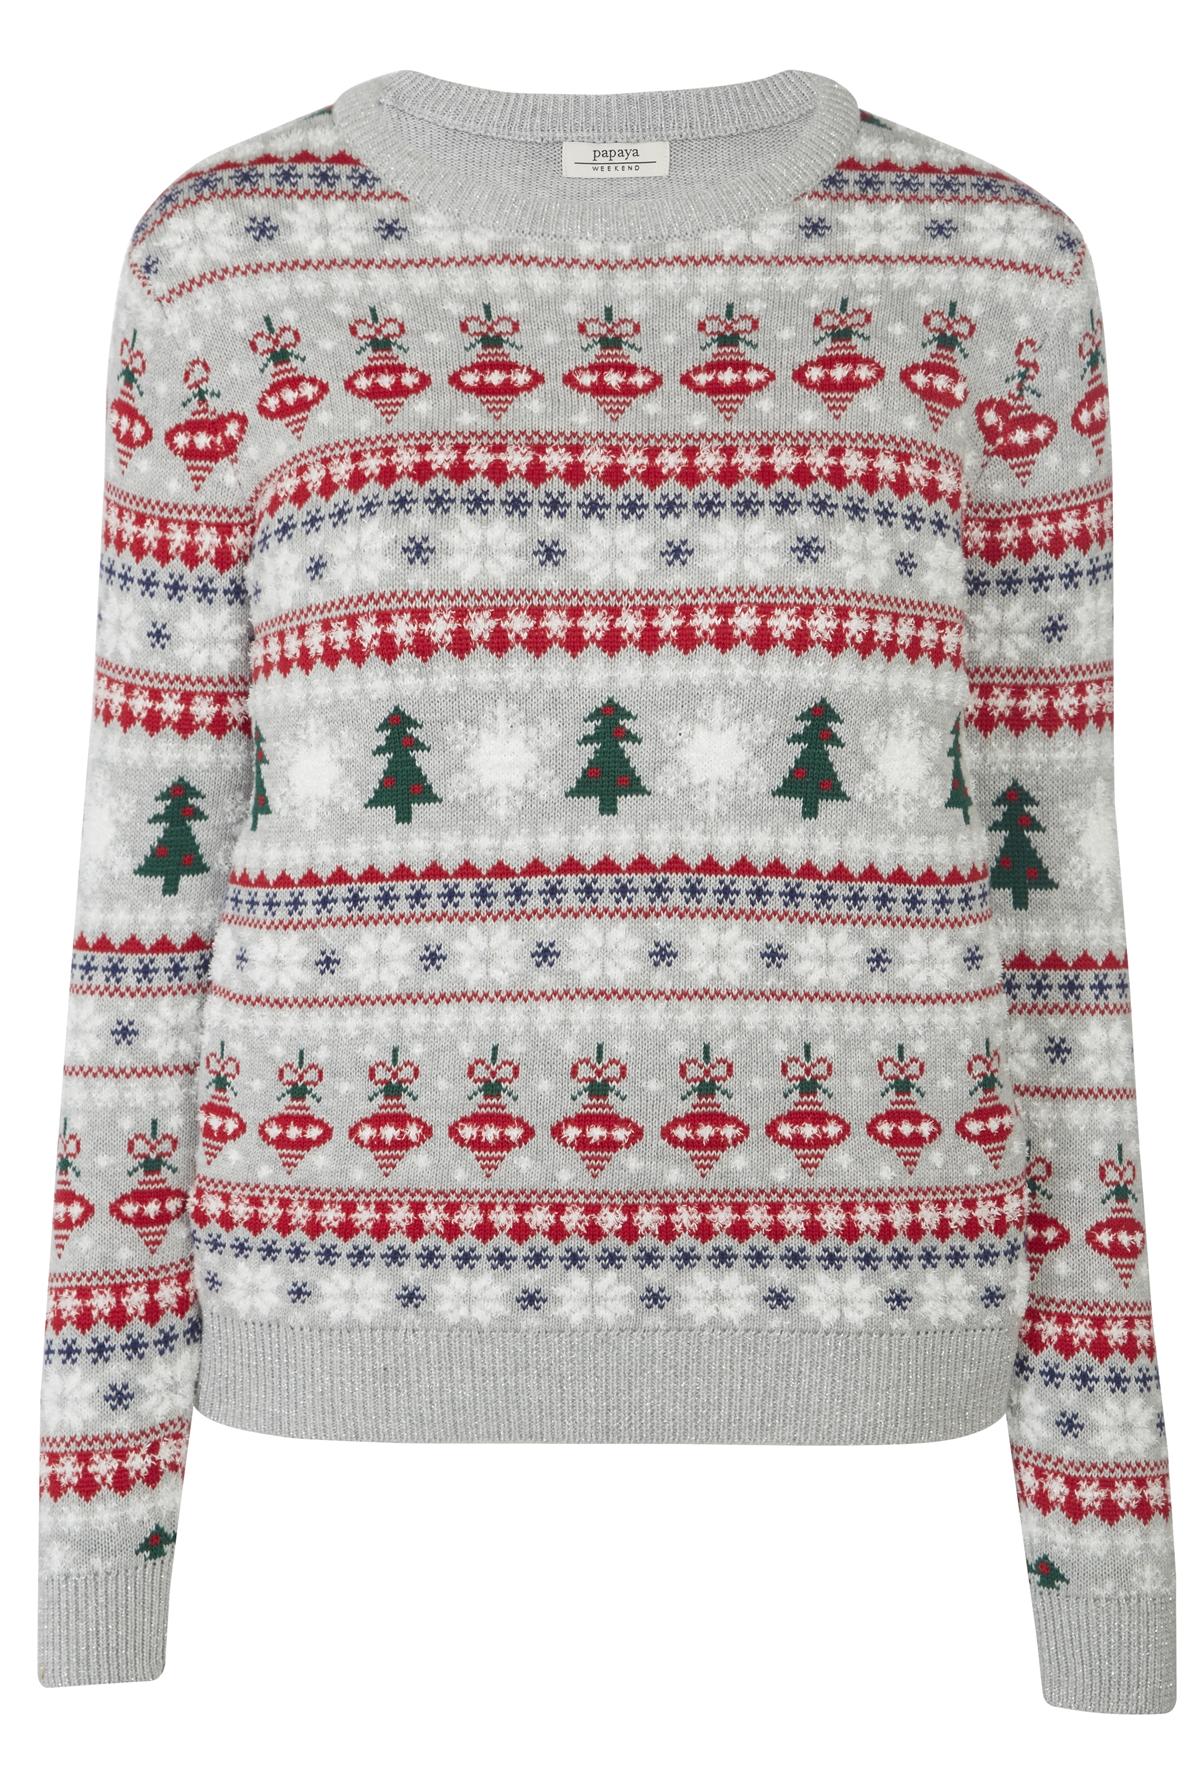 christmas tree print patterned knit jumper matalan grey white